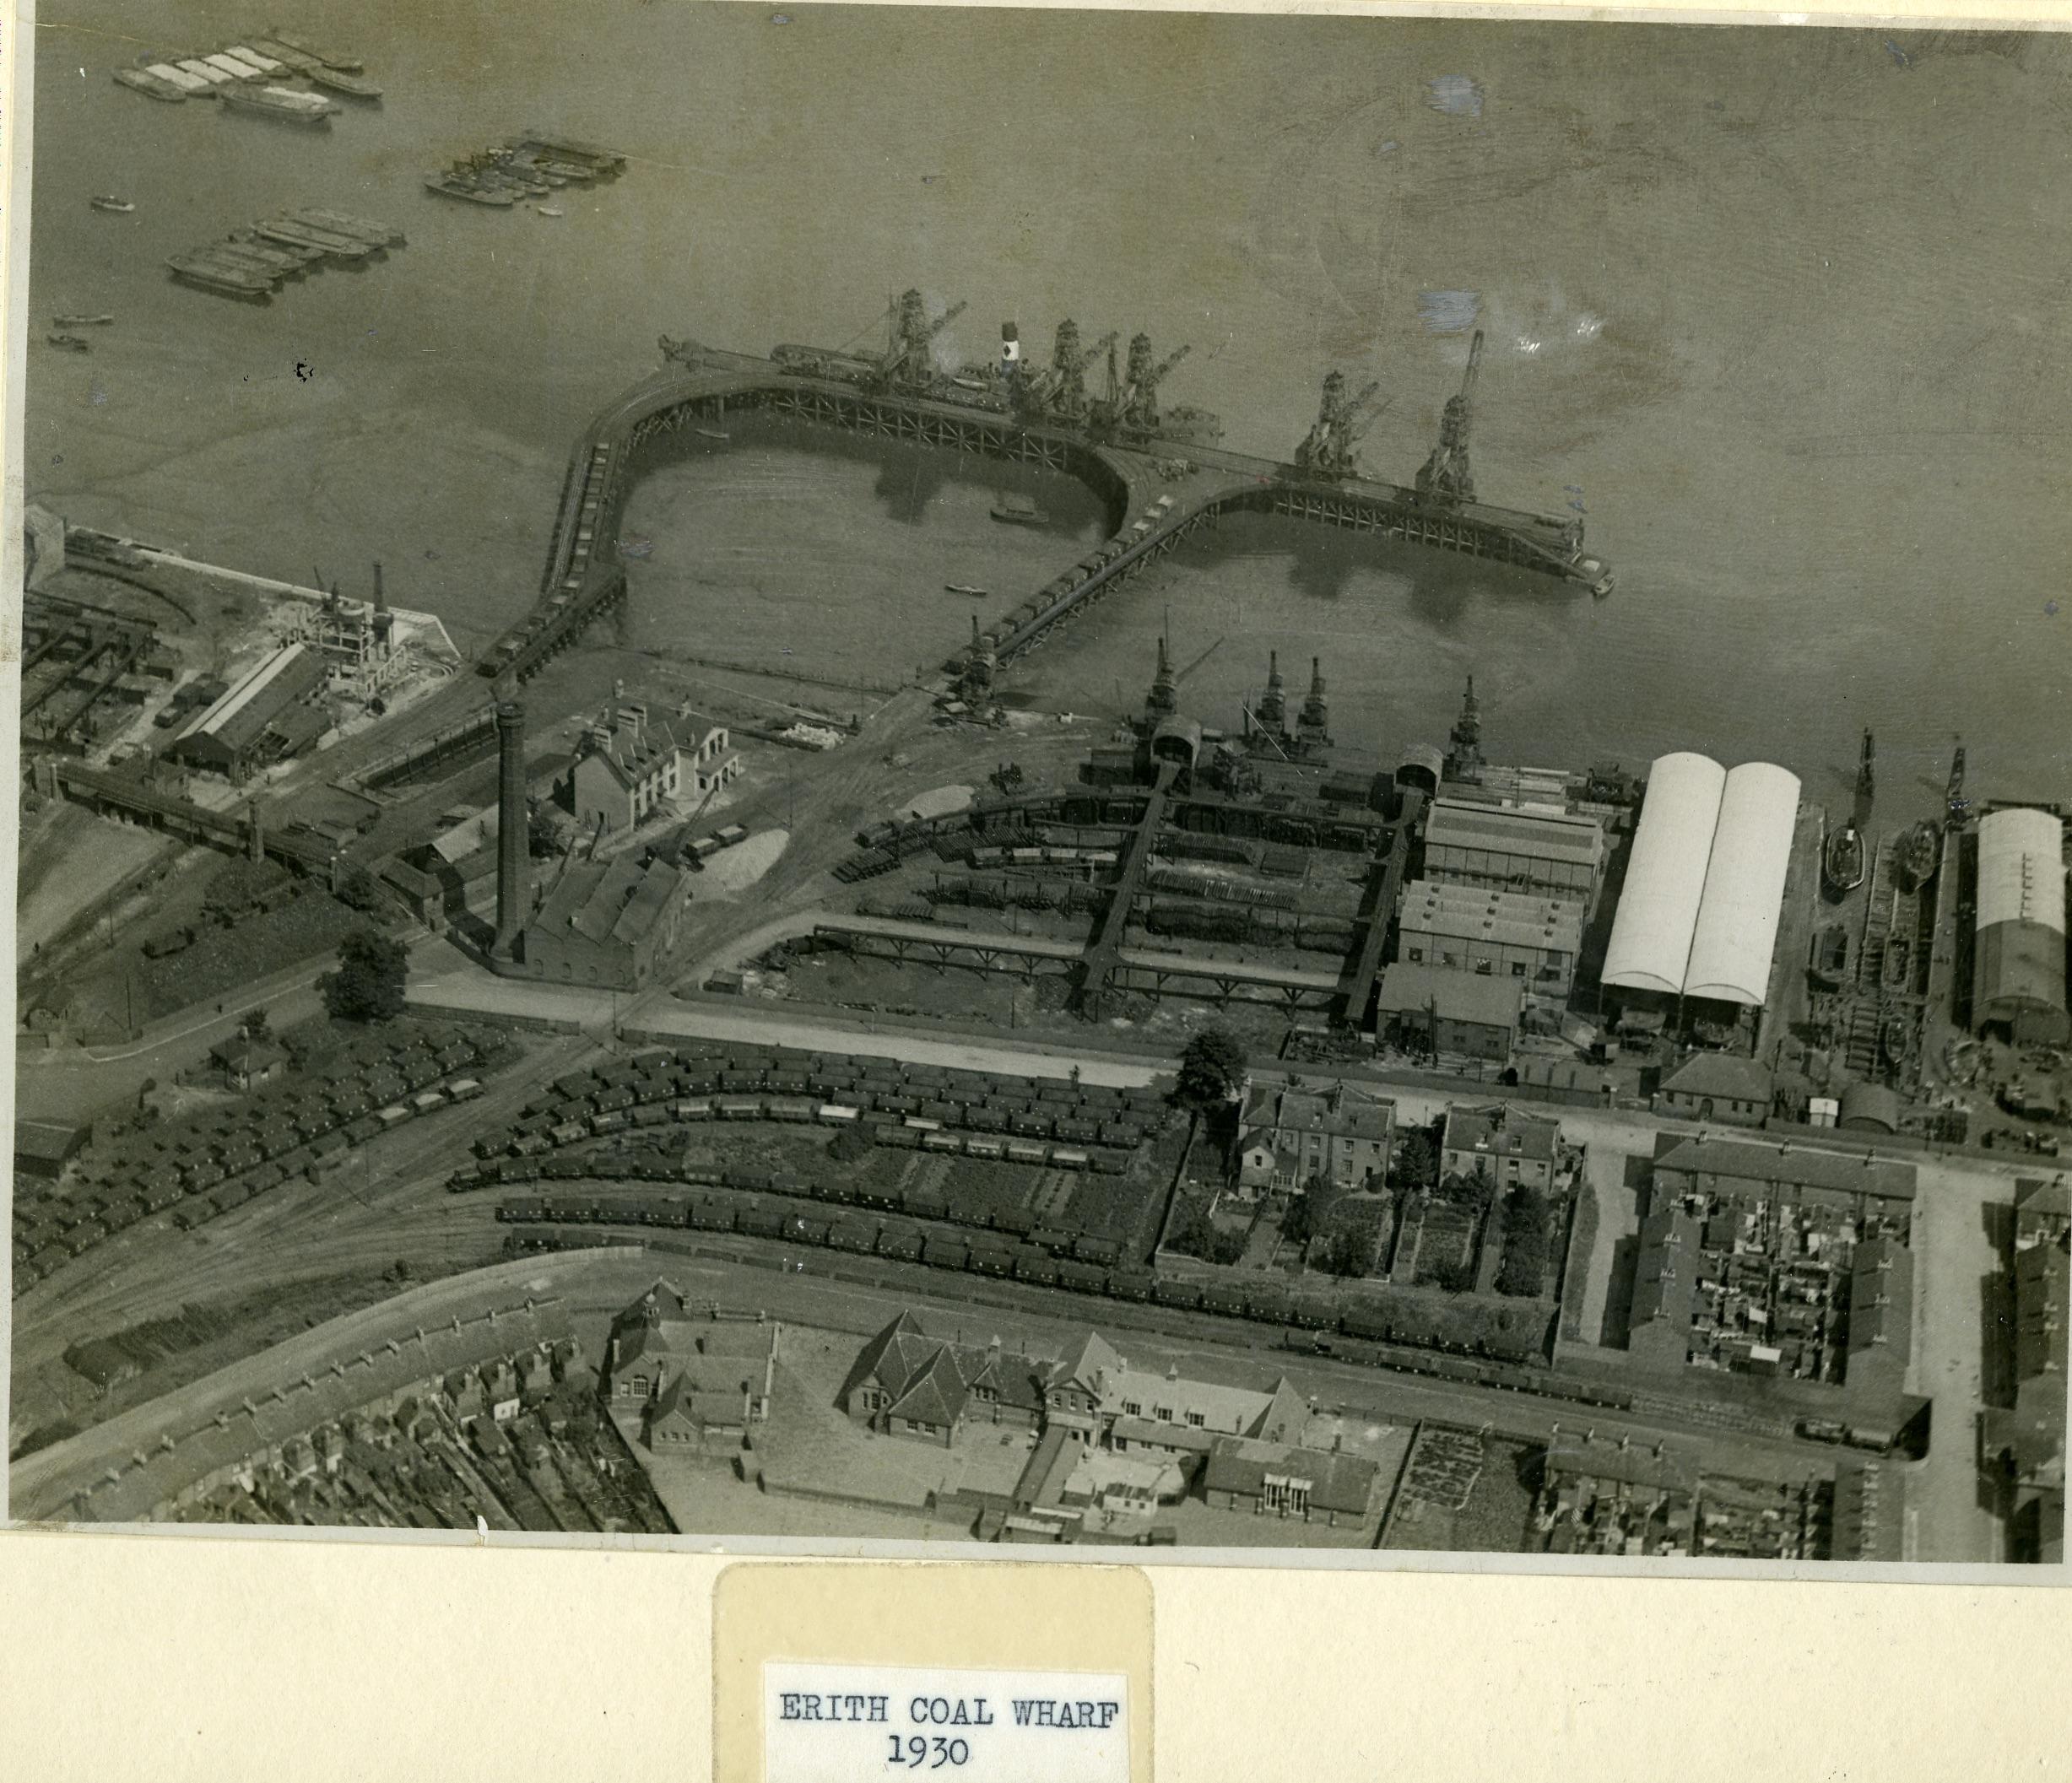 Erith Coal Wharf (c. 1930)